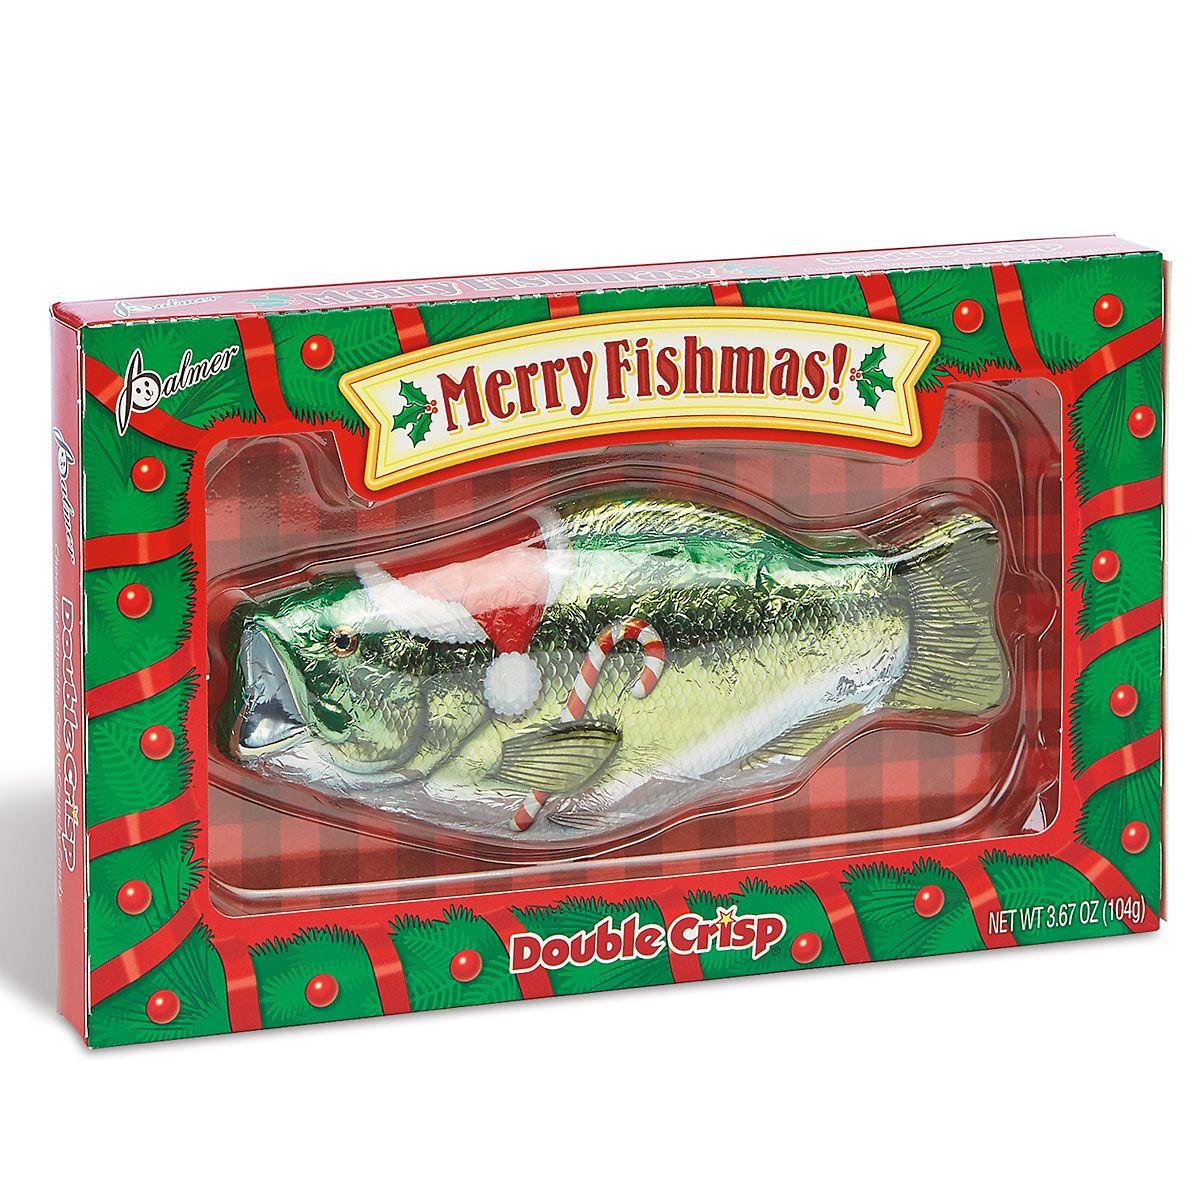 Merry Fishmas Chocolate Bass